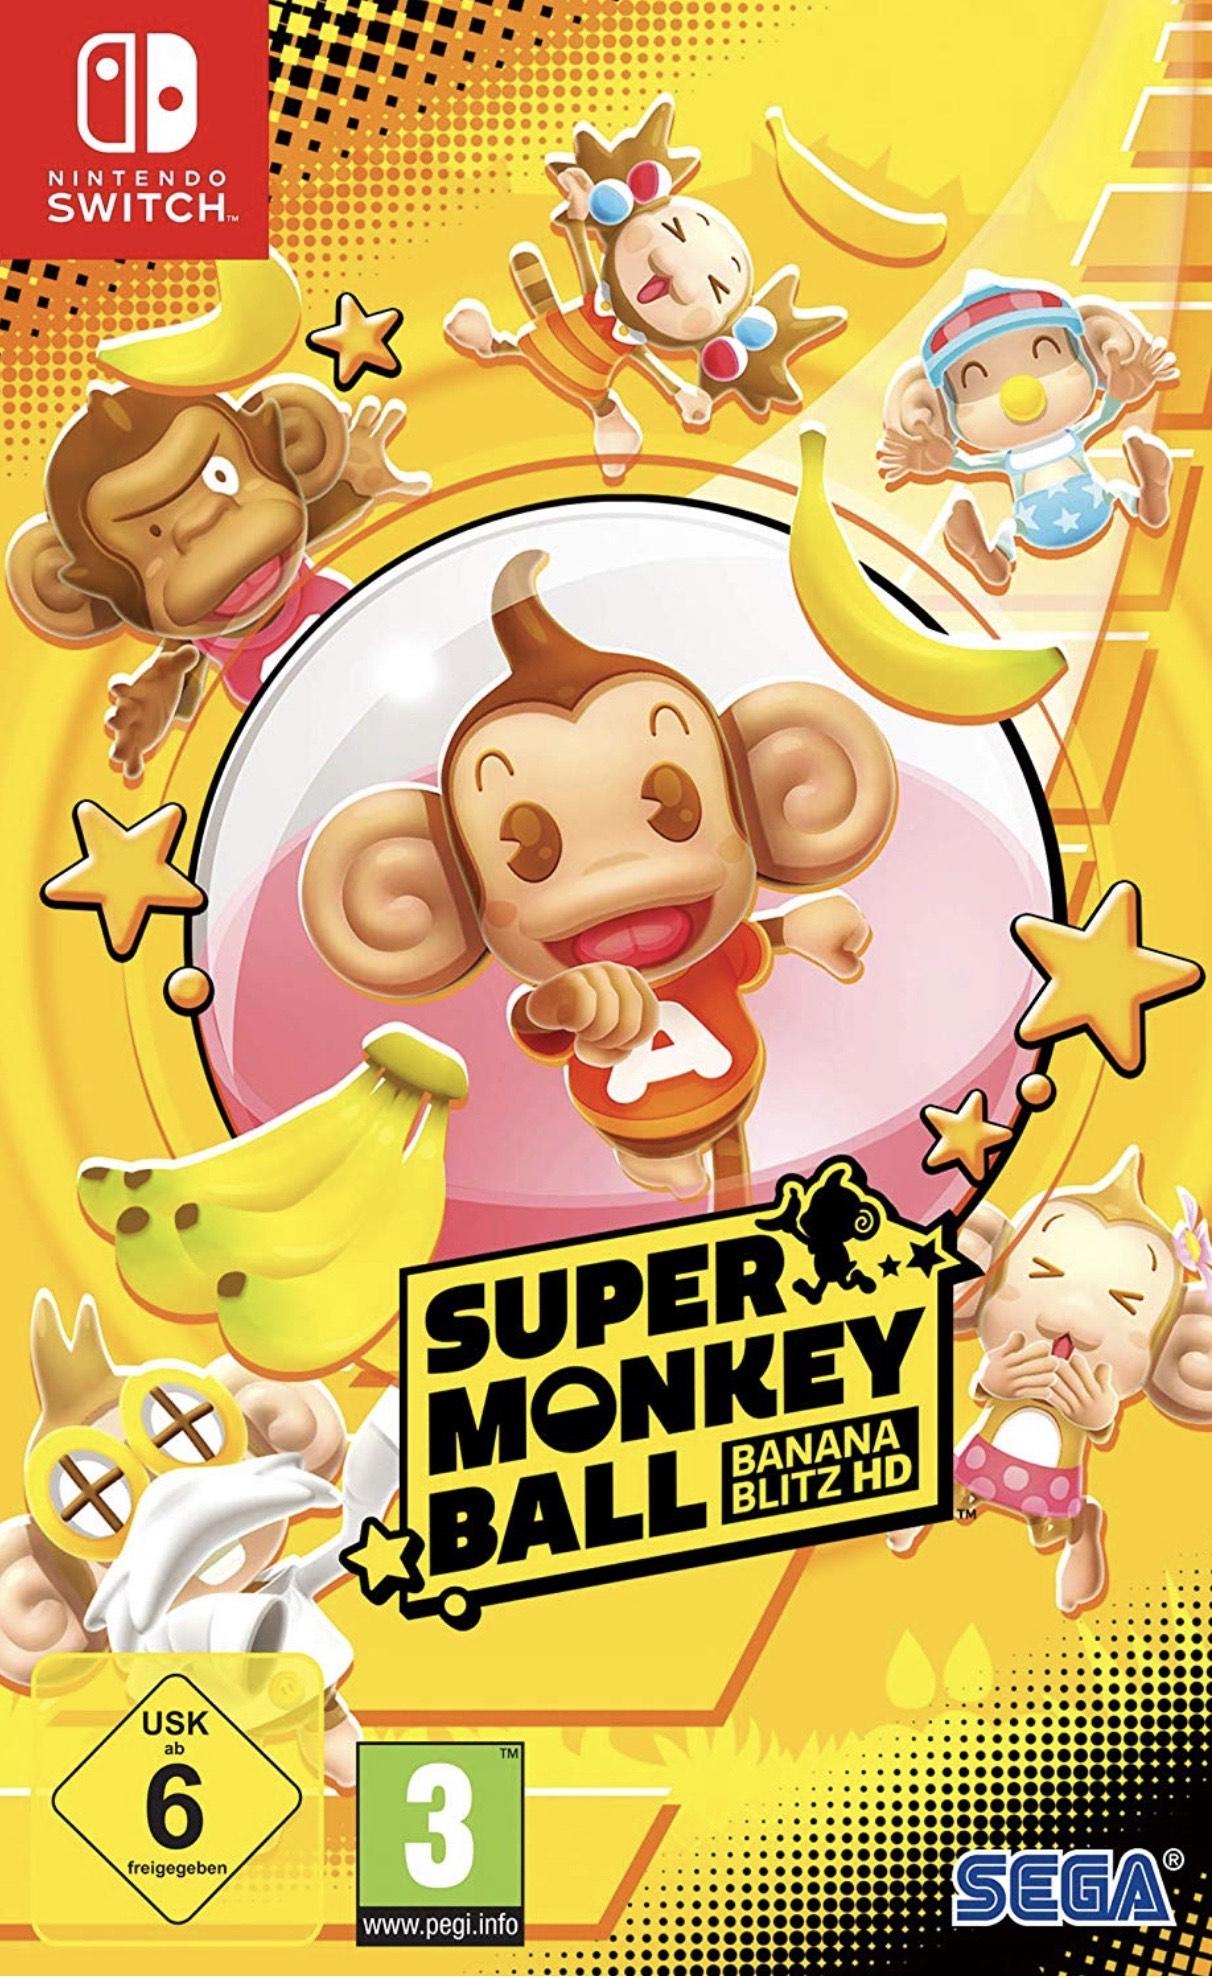 Super Monkey Ball Banana Blitz HD (Nintendo Switch) - £23.70 @ The Game Collection